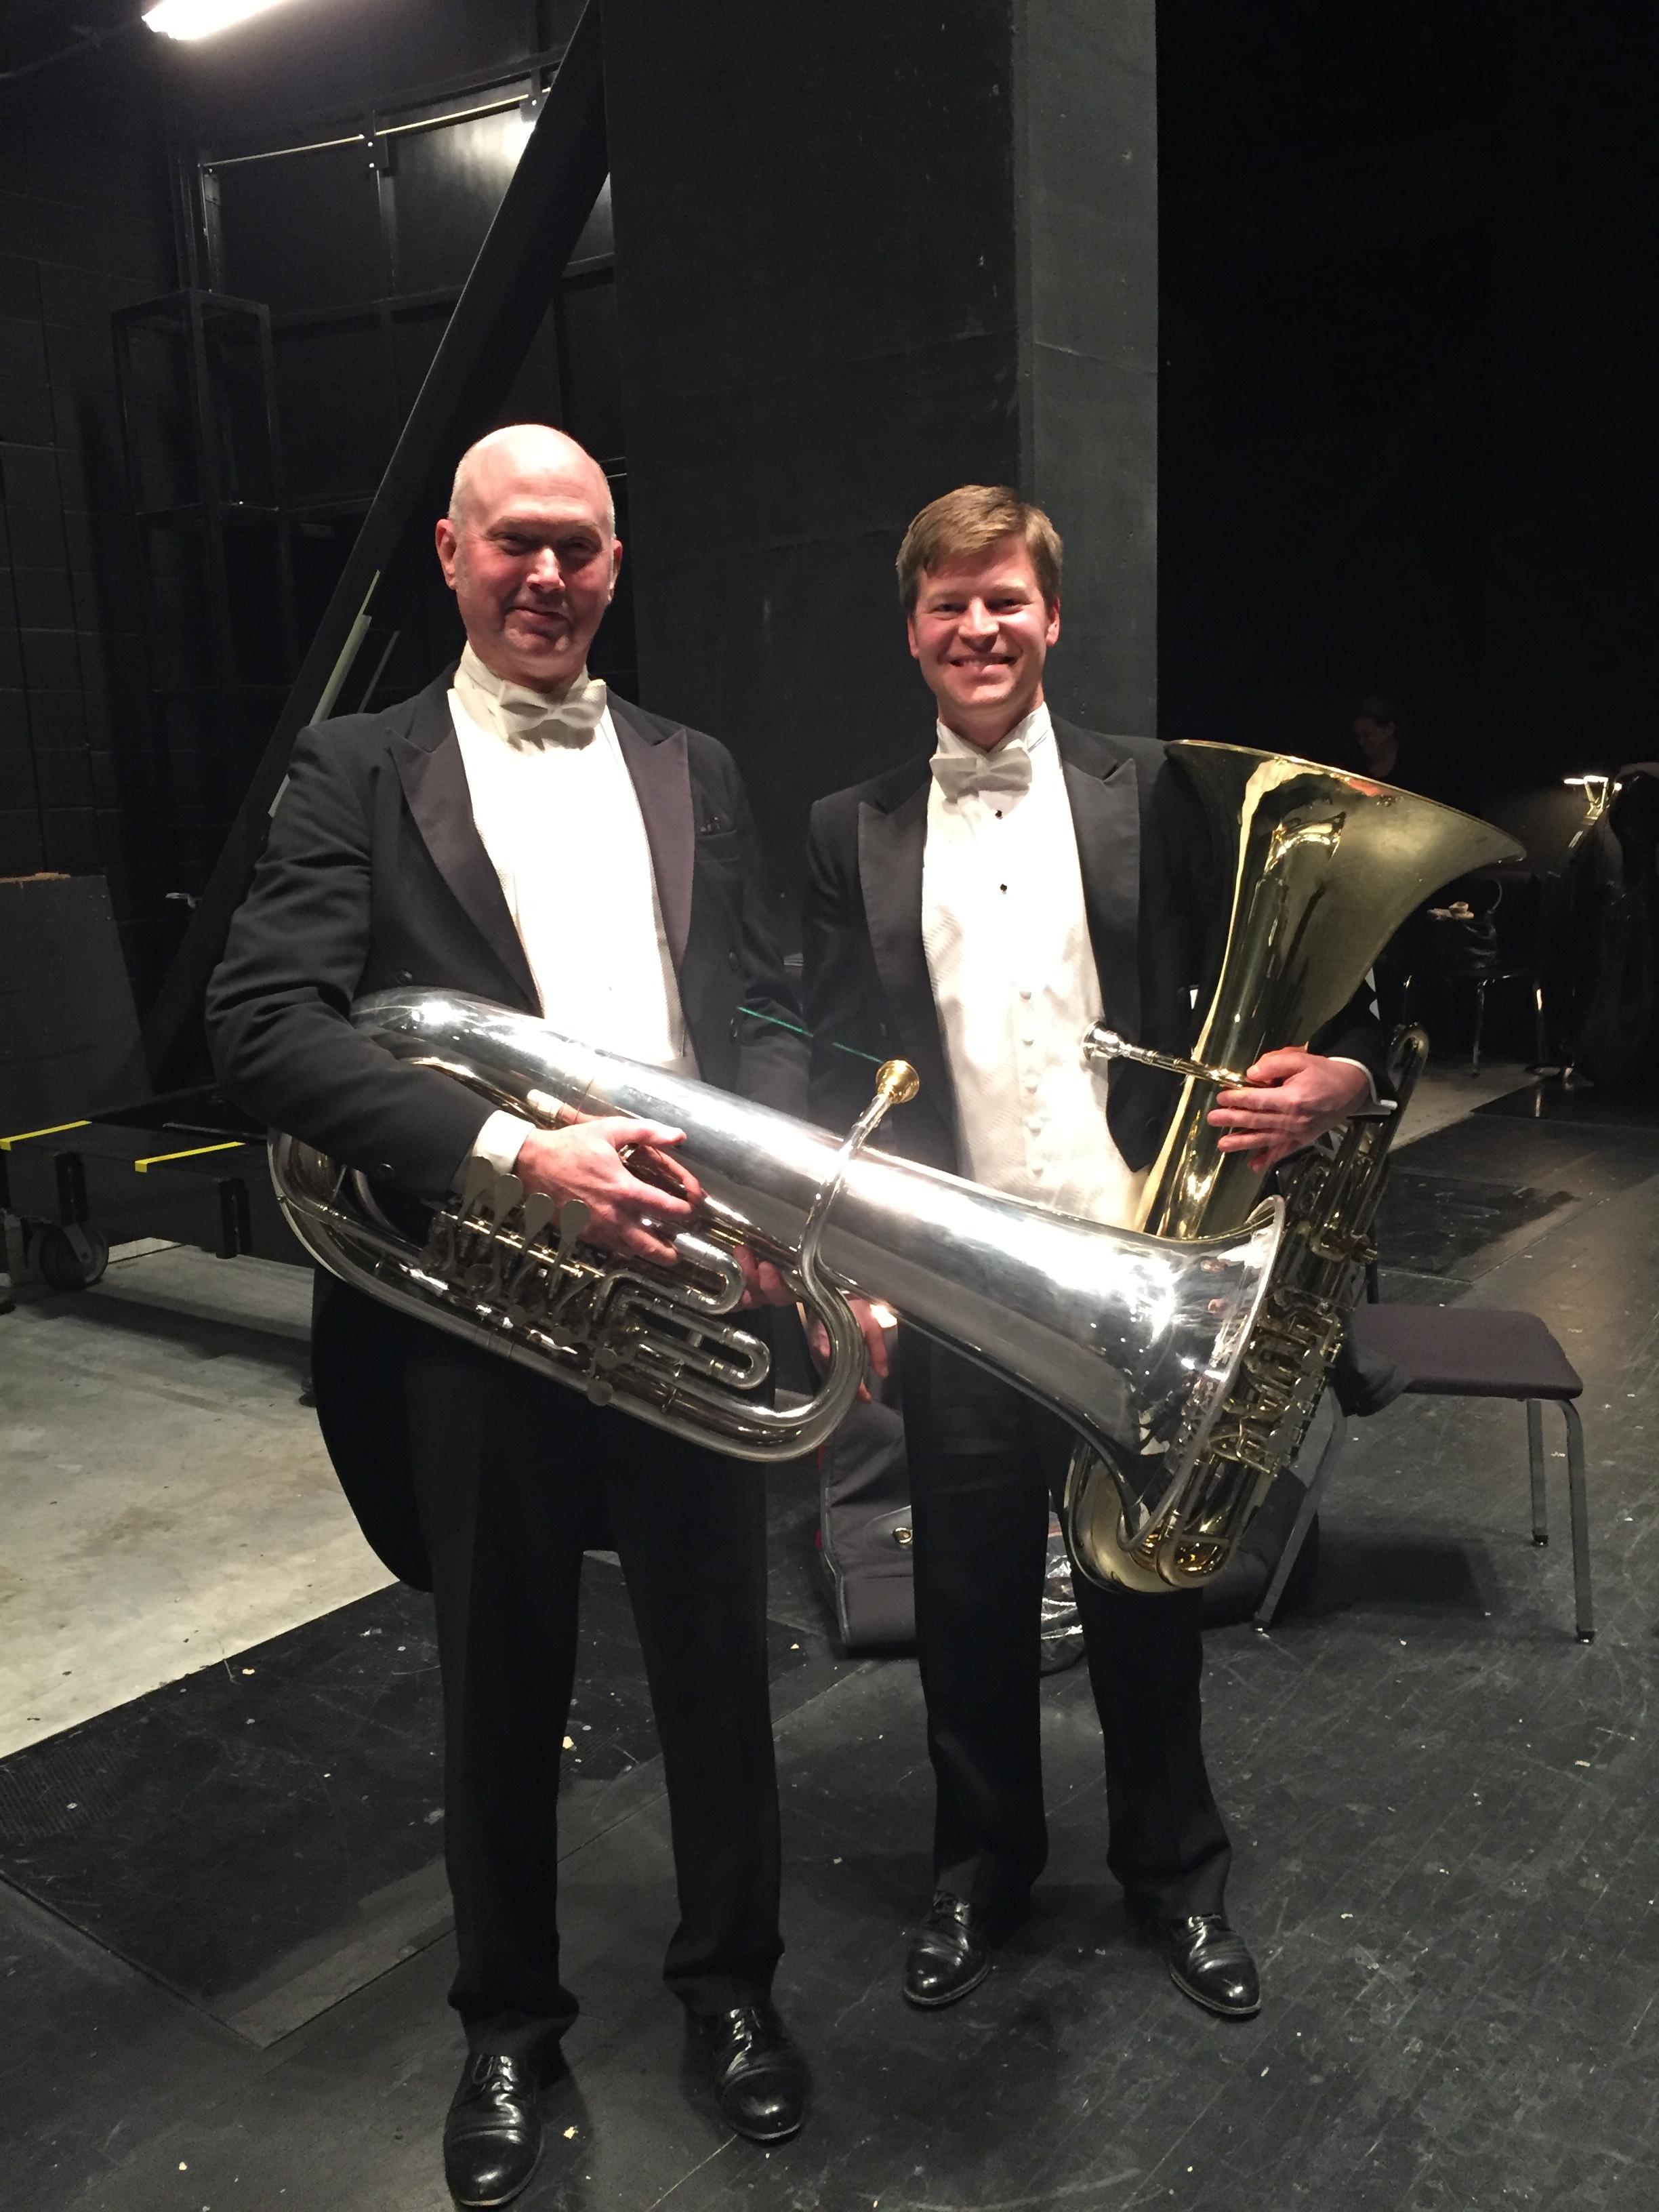 Ted Cox, Principal Tuba Oklahoma City Philharmonic, and I after Symphonie Fantastique.